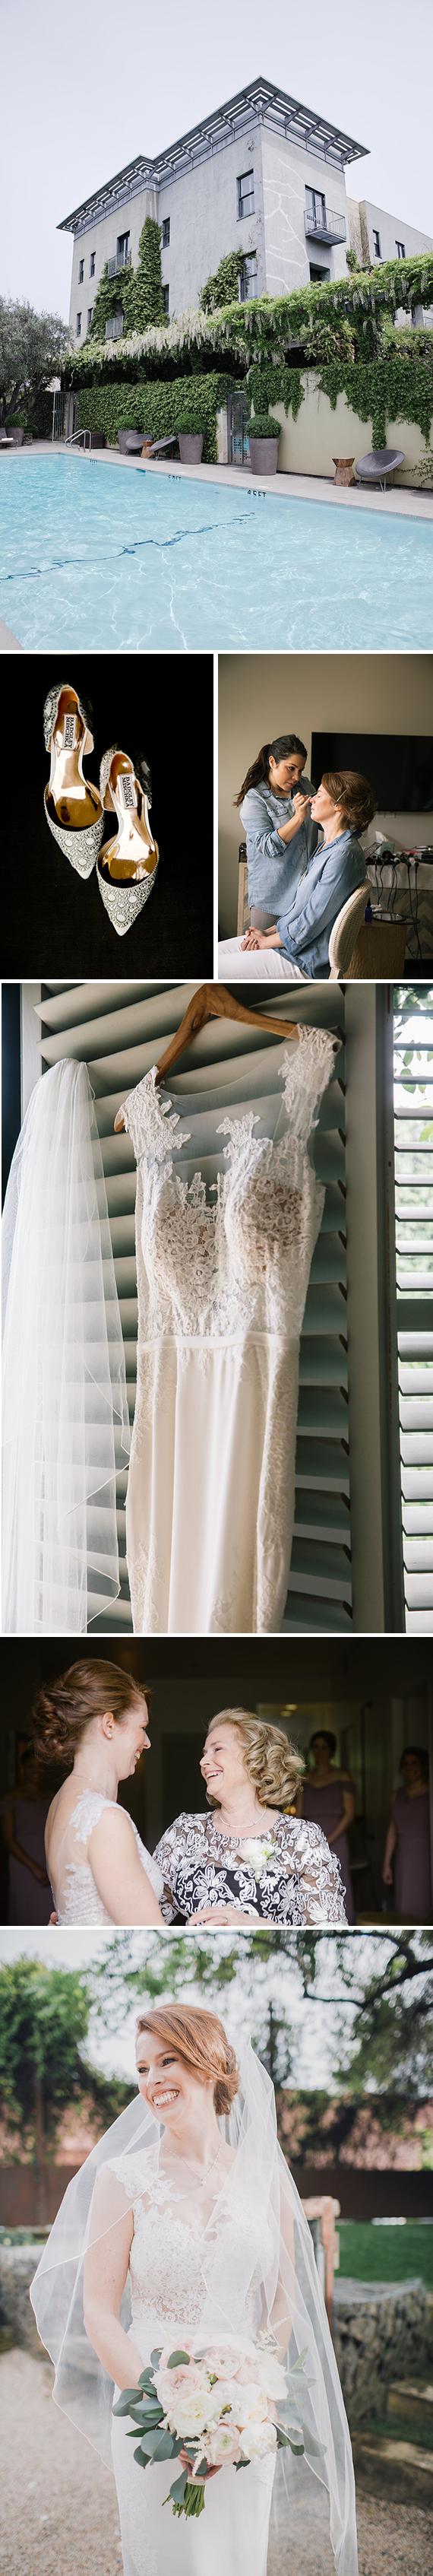 Barndiva Healdsburg CA wedding